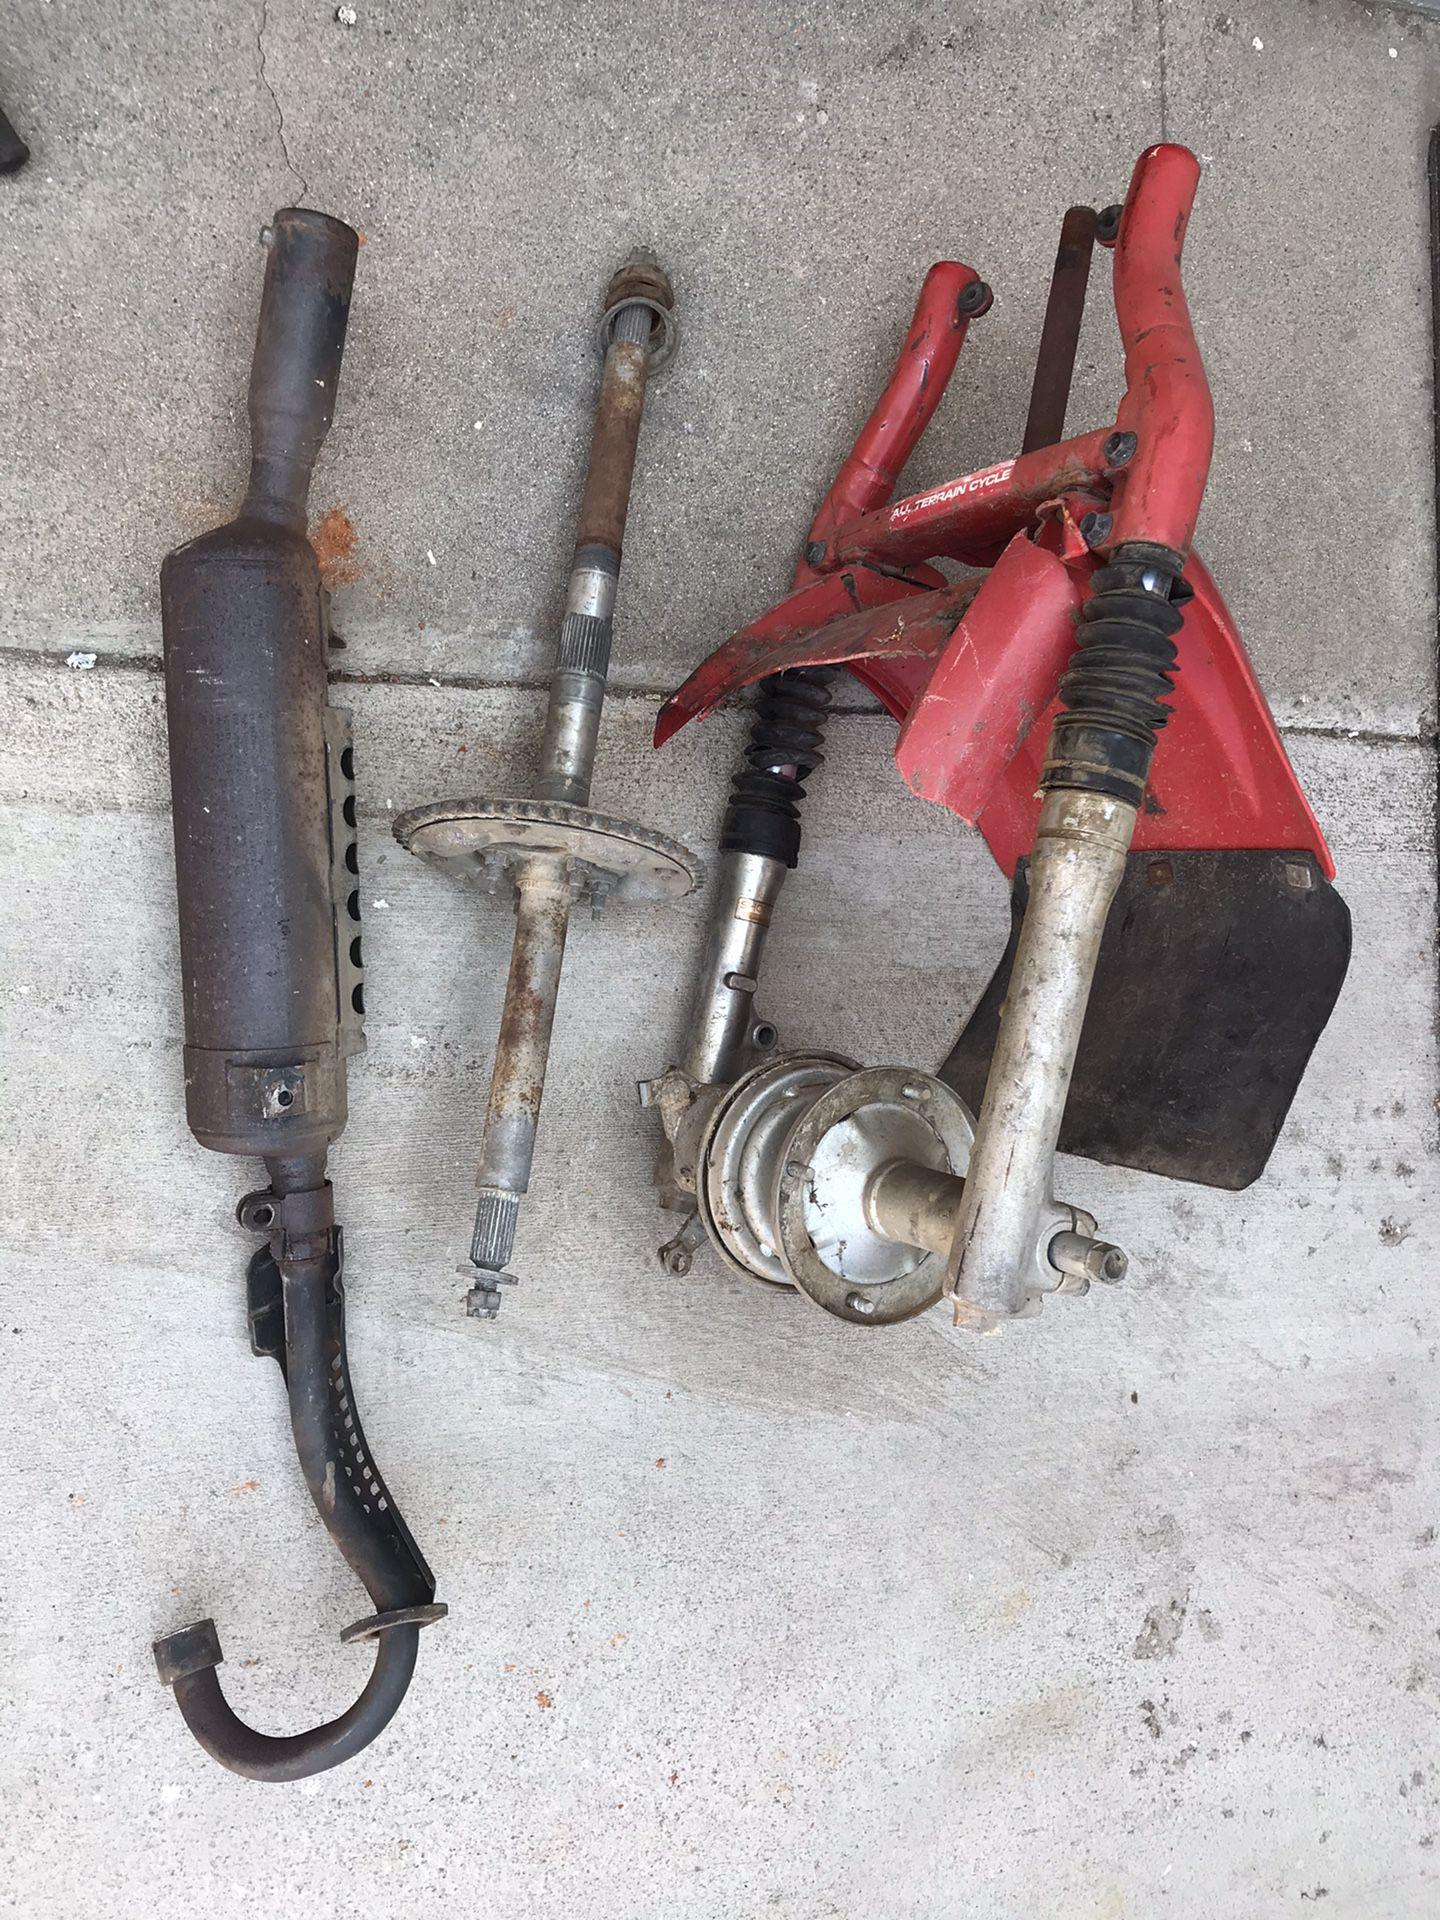 Atc Parts $80